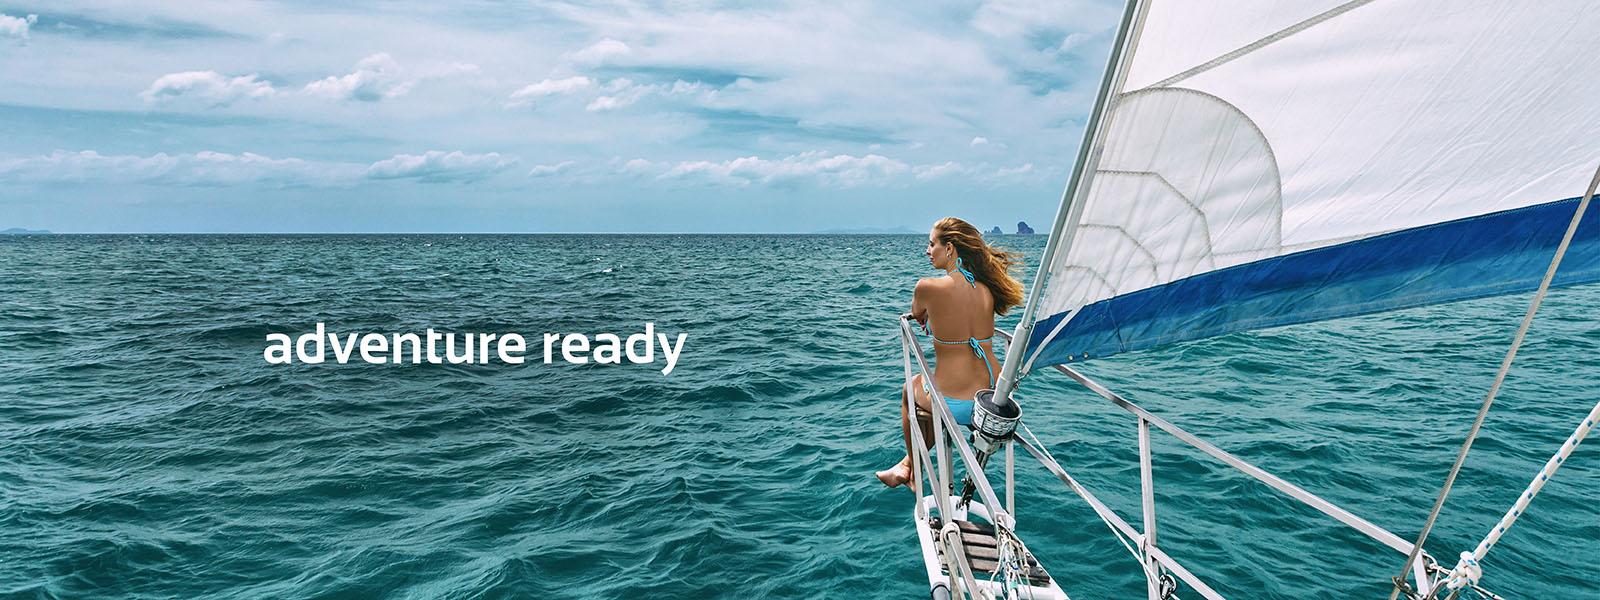 Woman in bikini on a boat in the ocean.